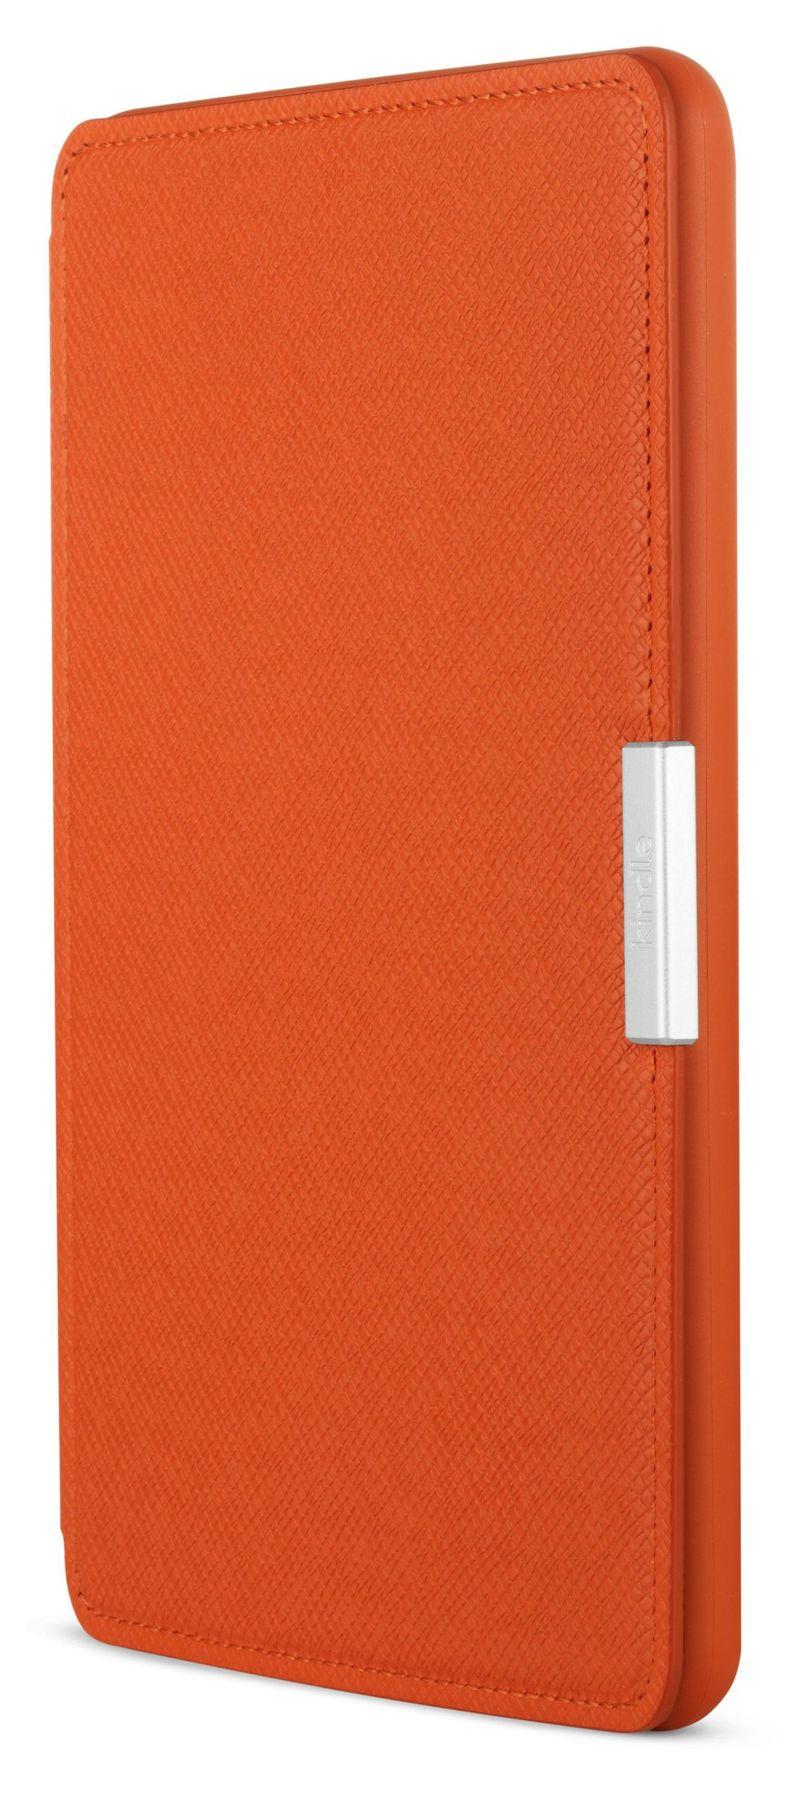 Capa-Couro-Amazon-Kindle-Paperwhite-Laranja-8215212-Laranja_3